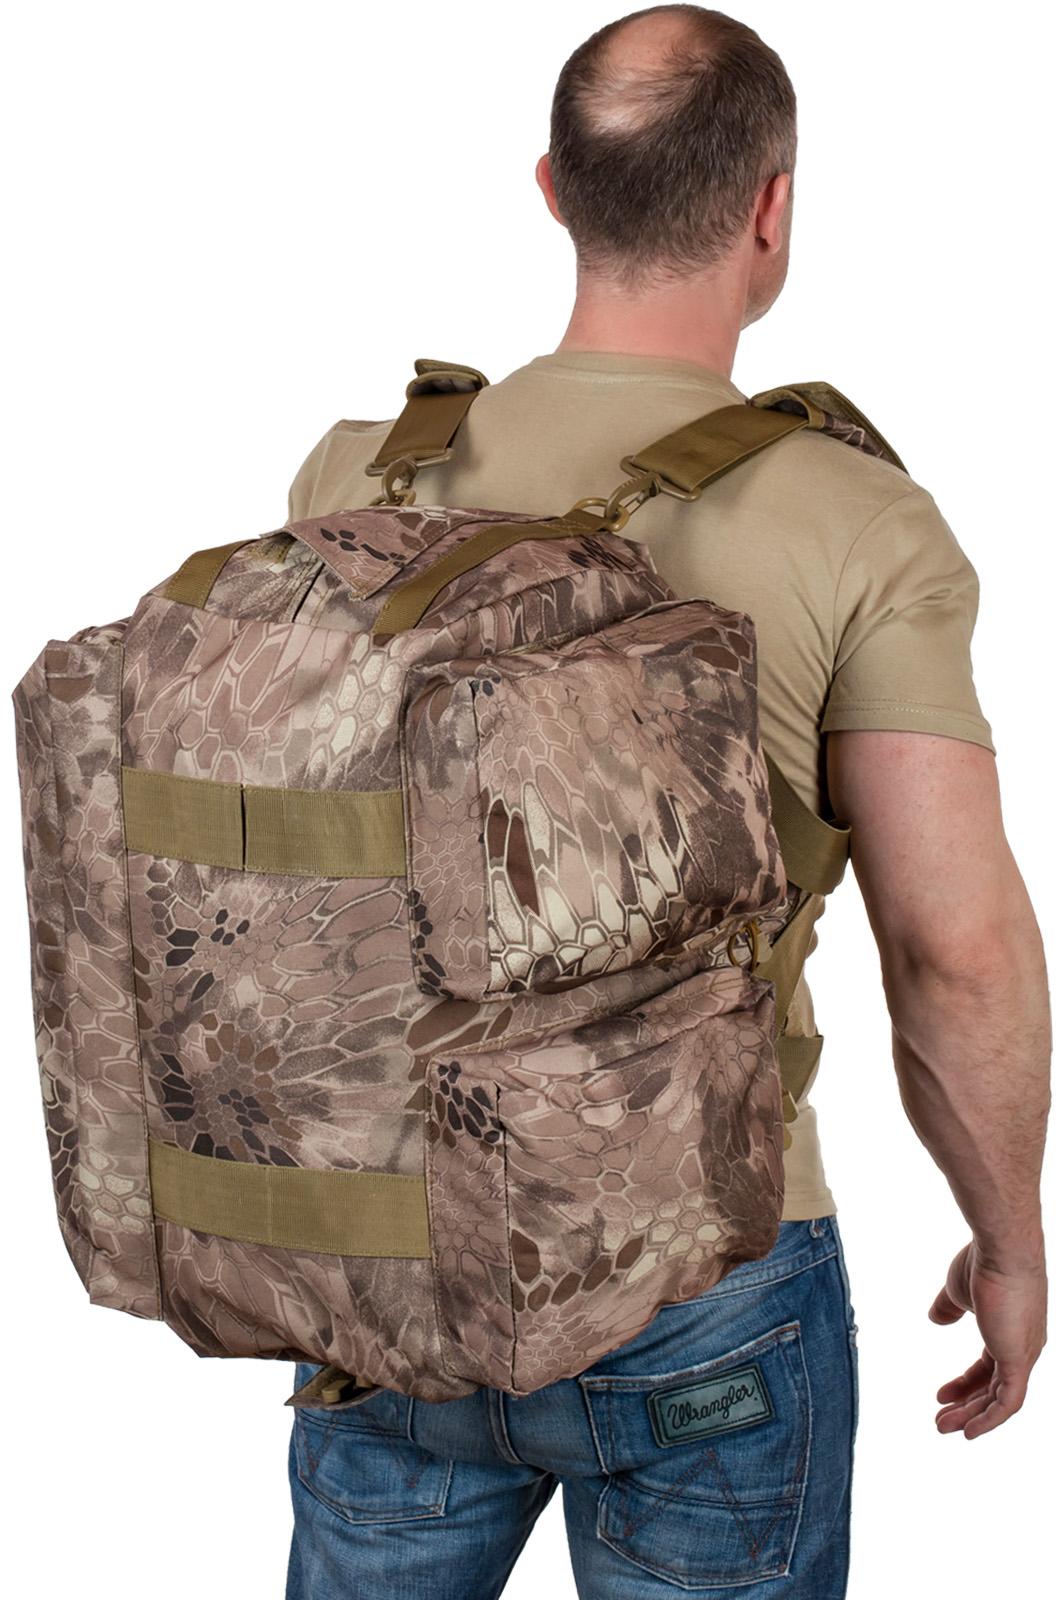 Тактическое снаряжение десанта: рюкзаки и сумки